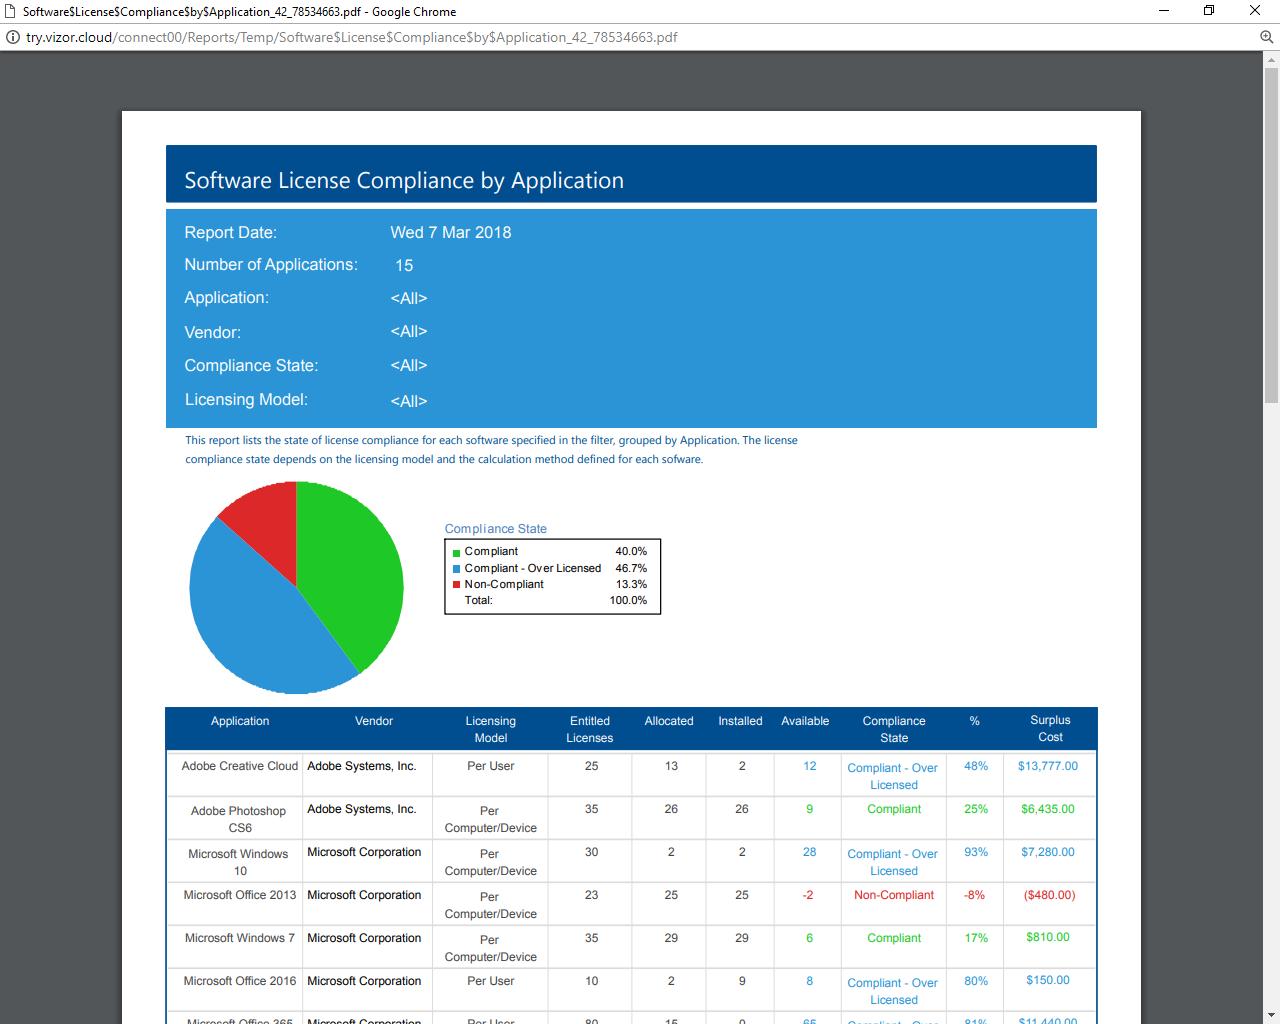 VIZOR IT Asset Management Software - 5